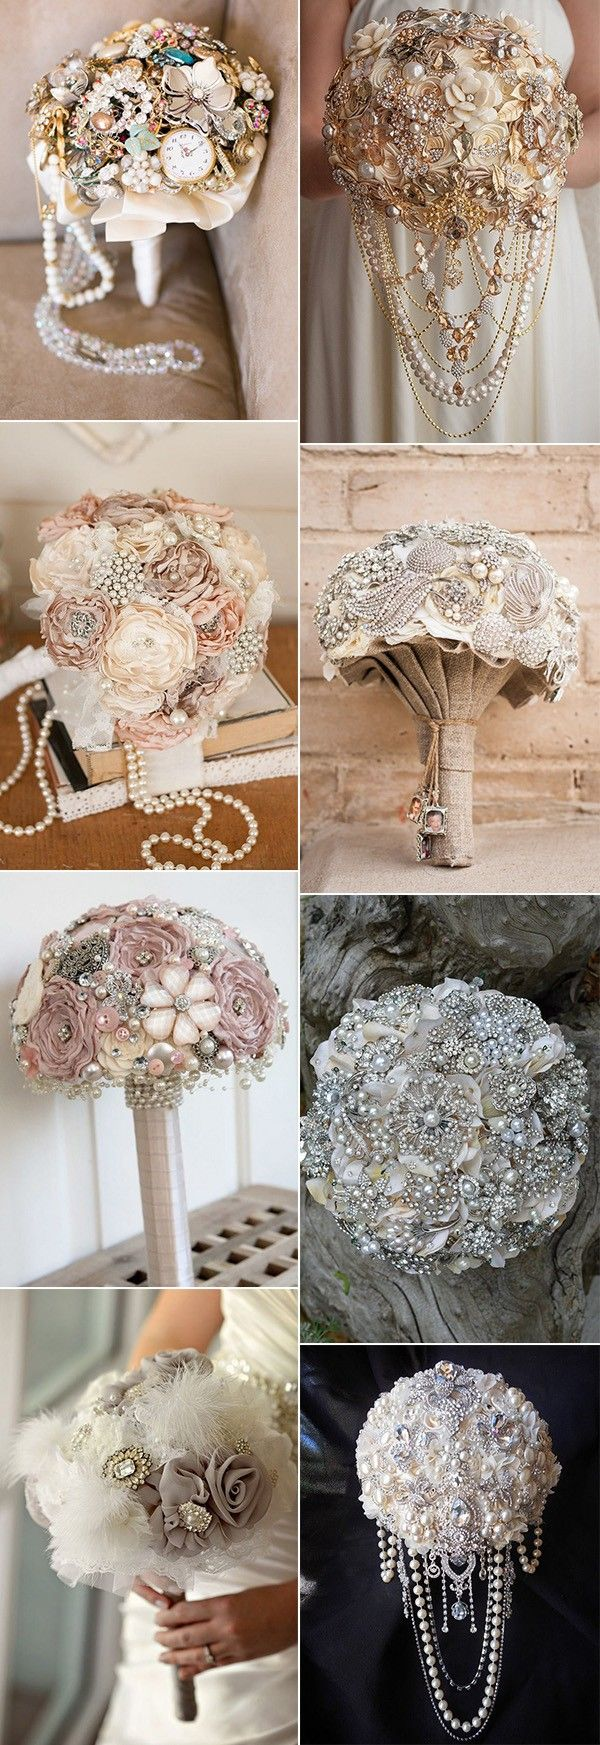 vintage brooch wedding bouquet ideas for 2018 #weddingideas #vintagewedding